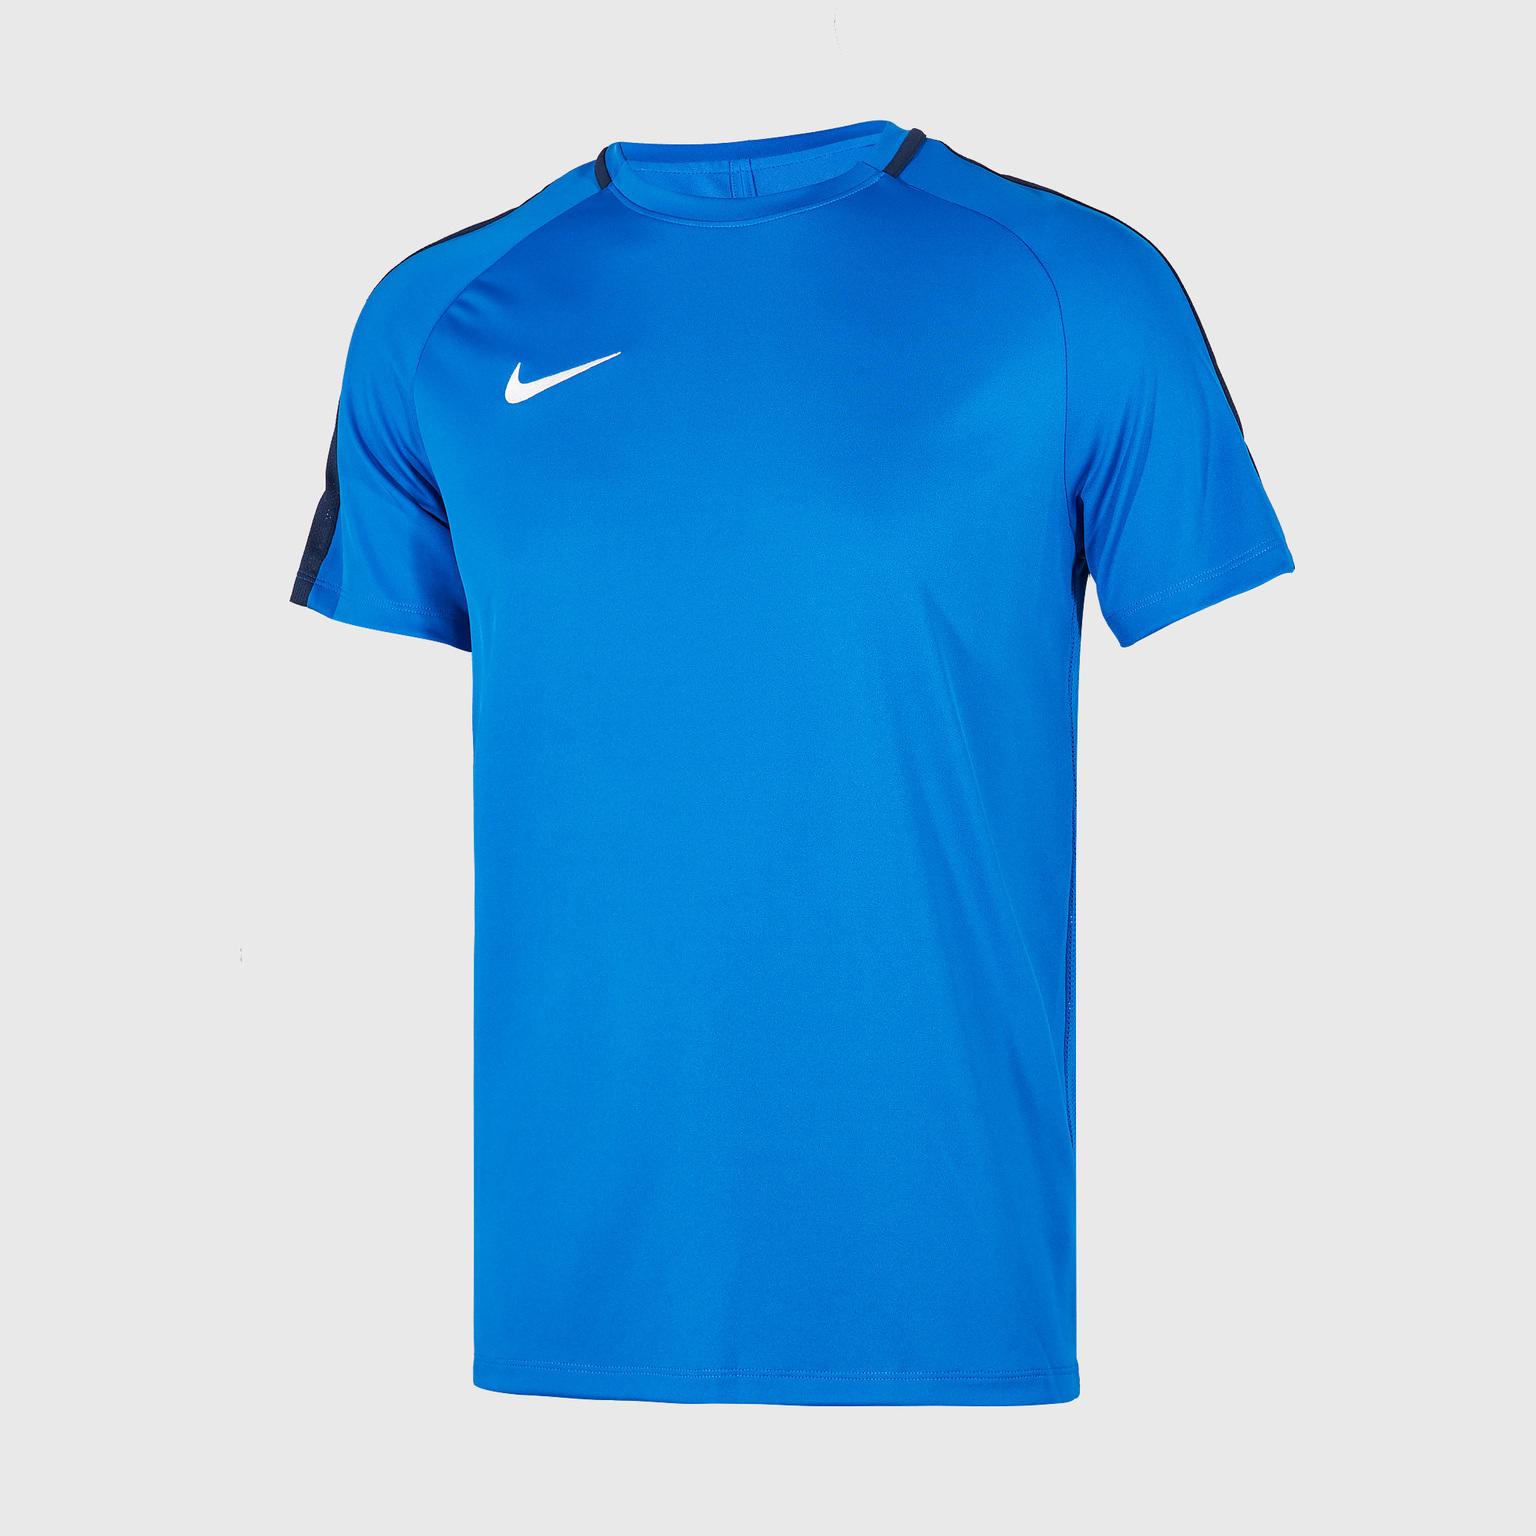 Футболка тренировочная Nike Dry Academy18 Top SS 893693-463